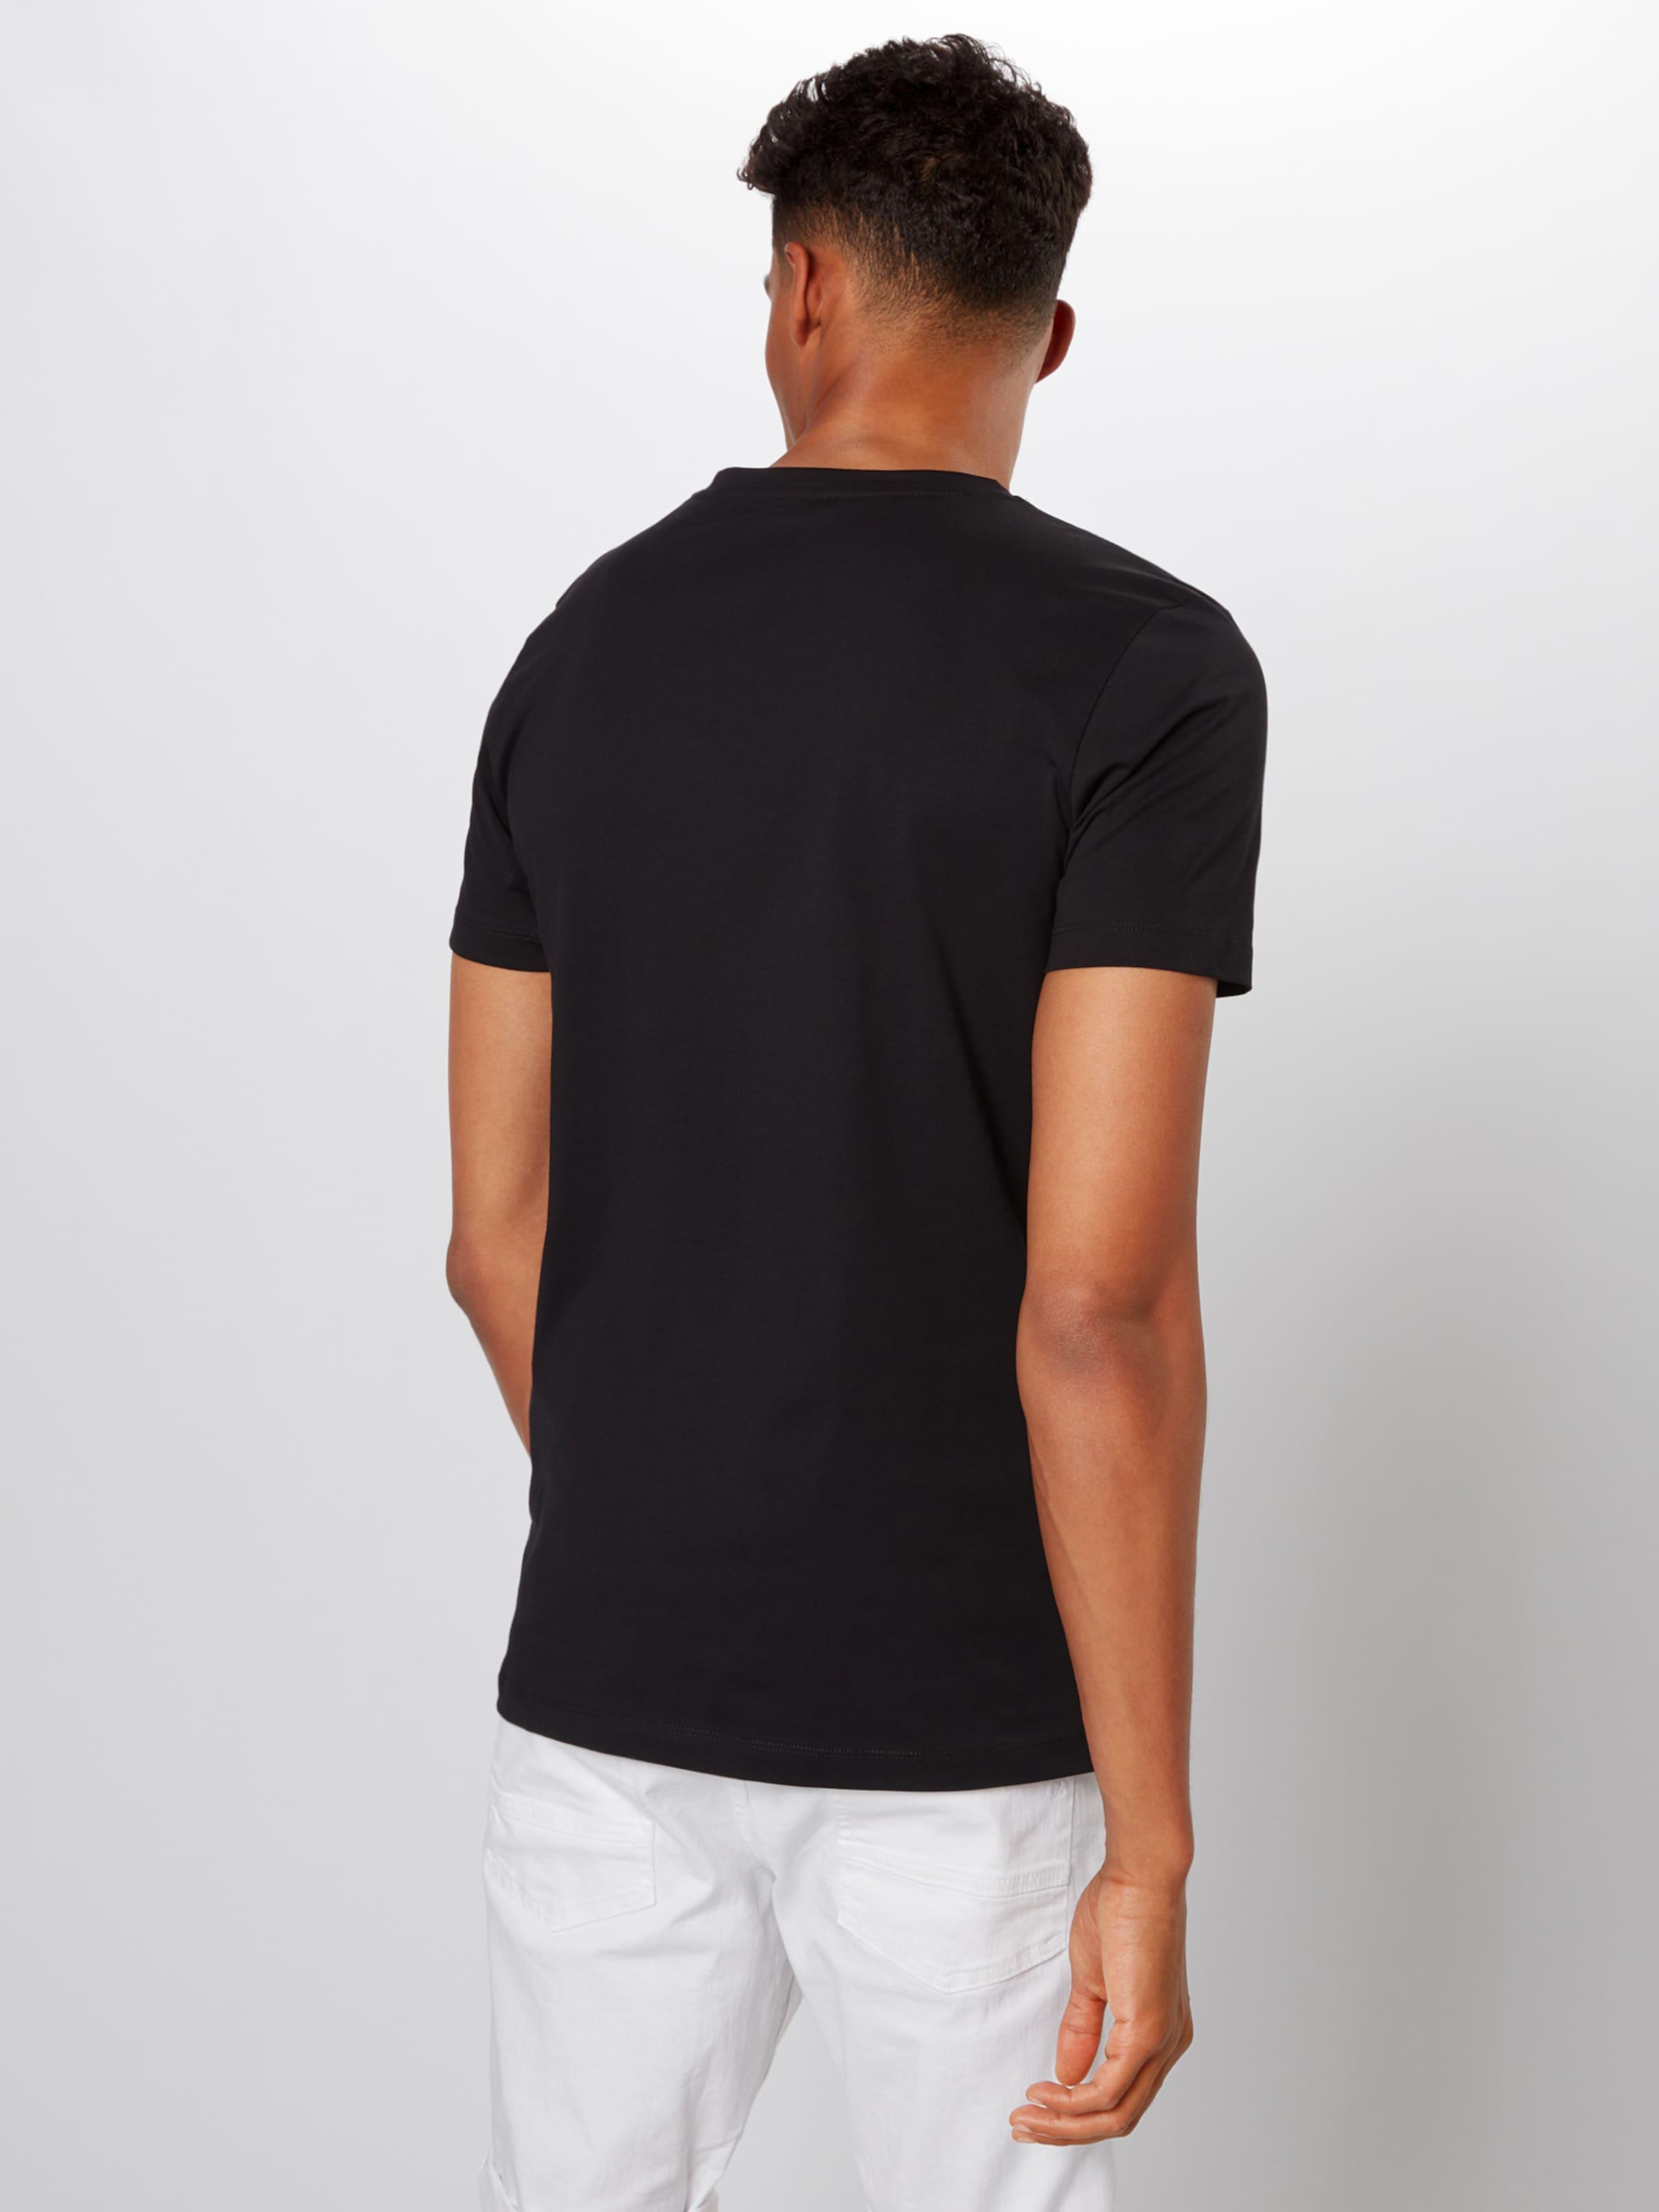 'tee Print' Denim T In Front Tom shirt Tailor Schwarz dxoWrCBeQE